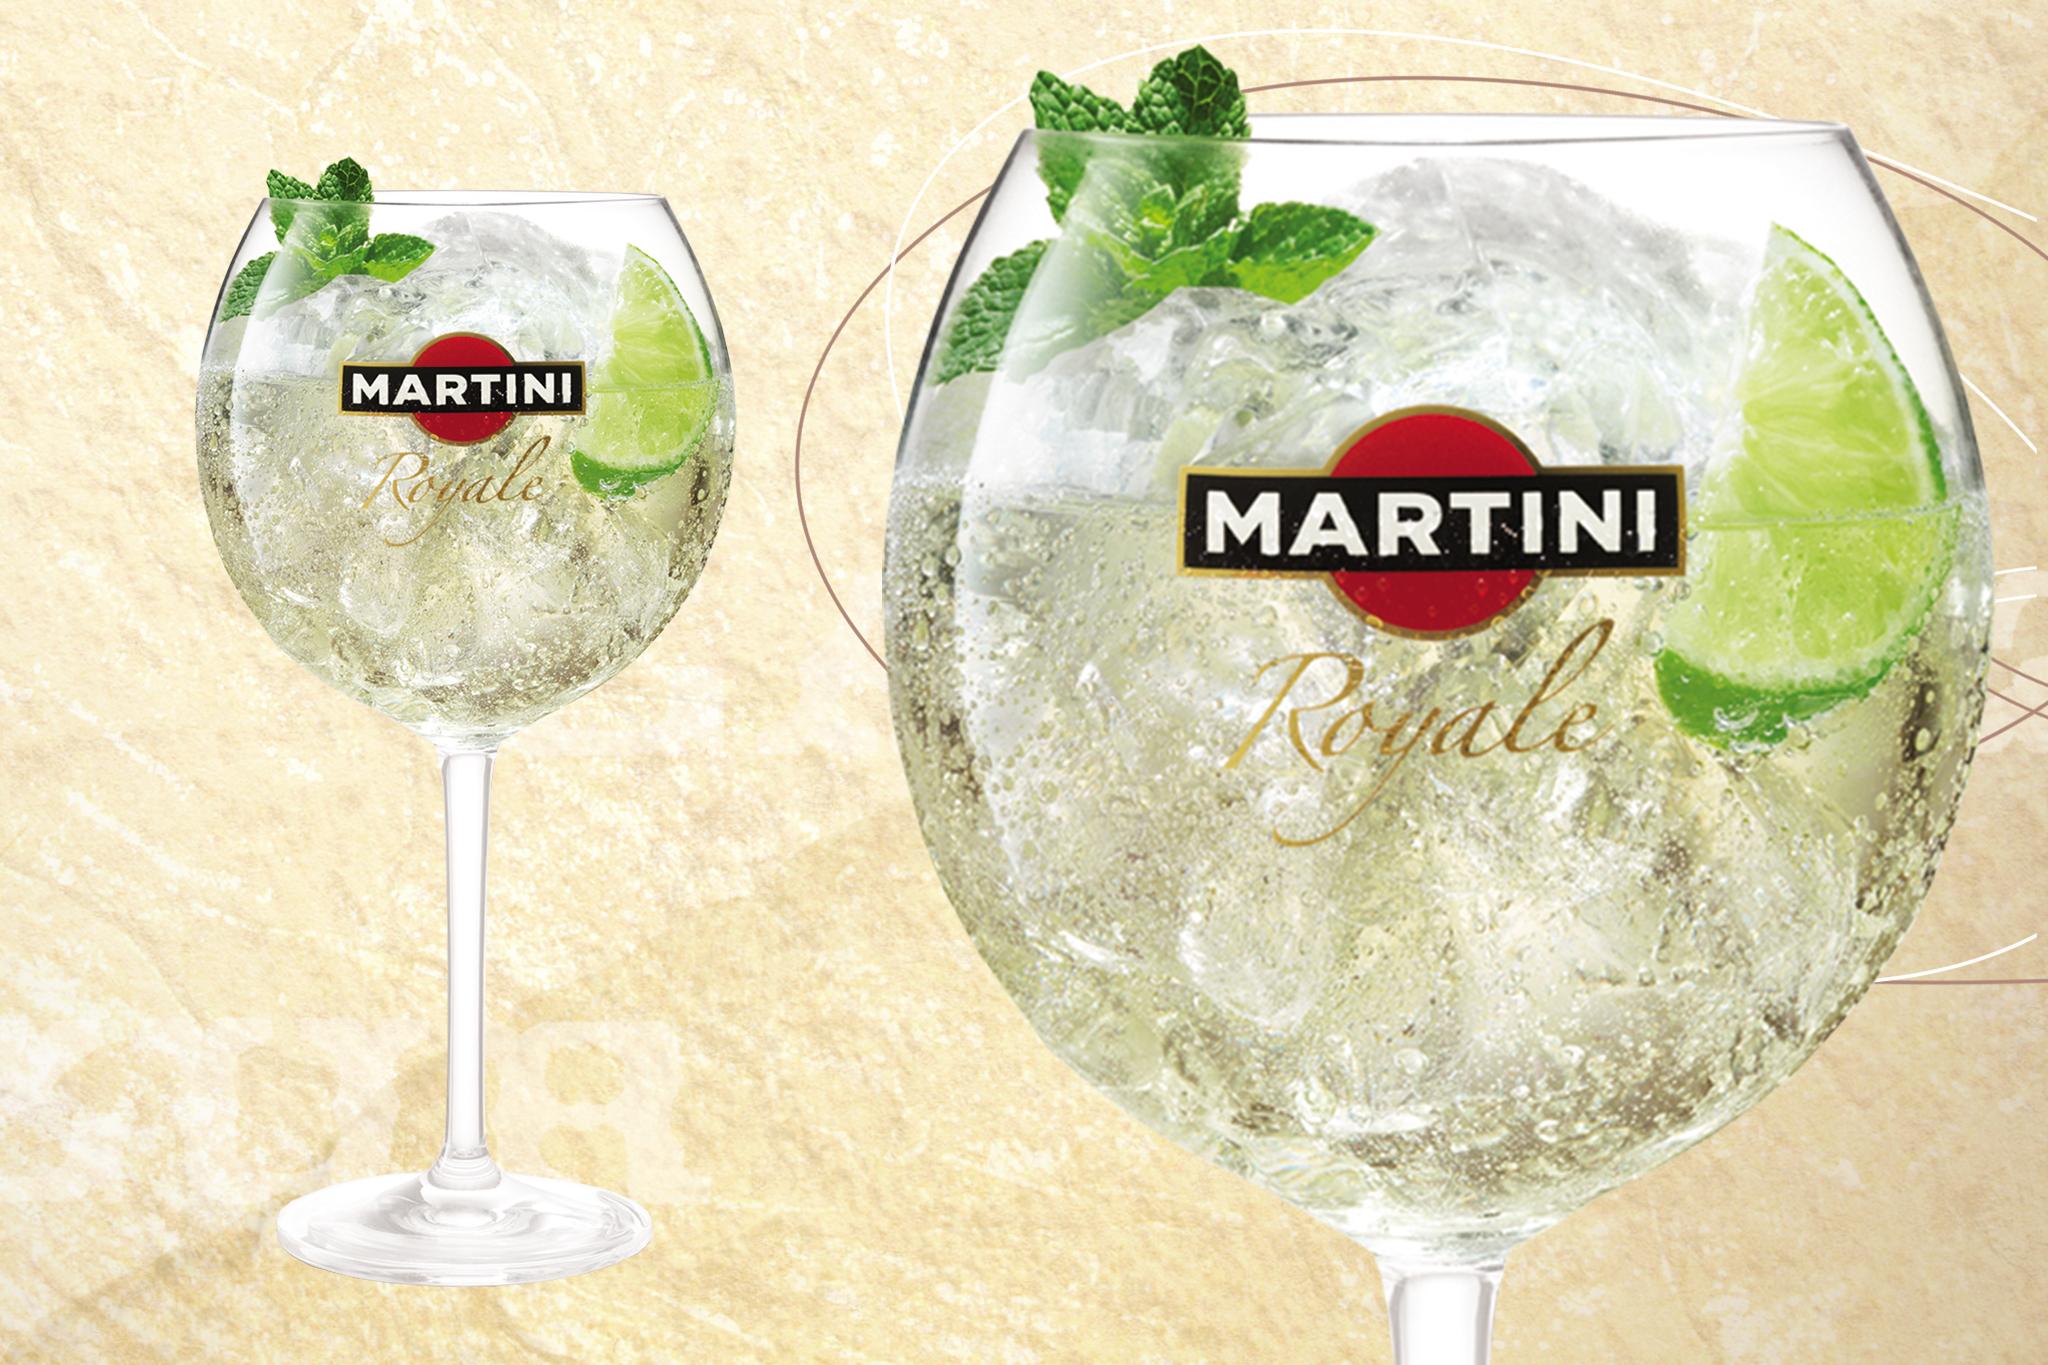 martini-royale